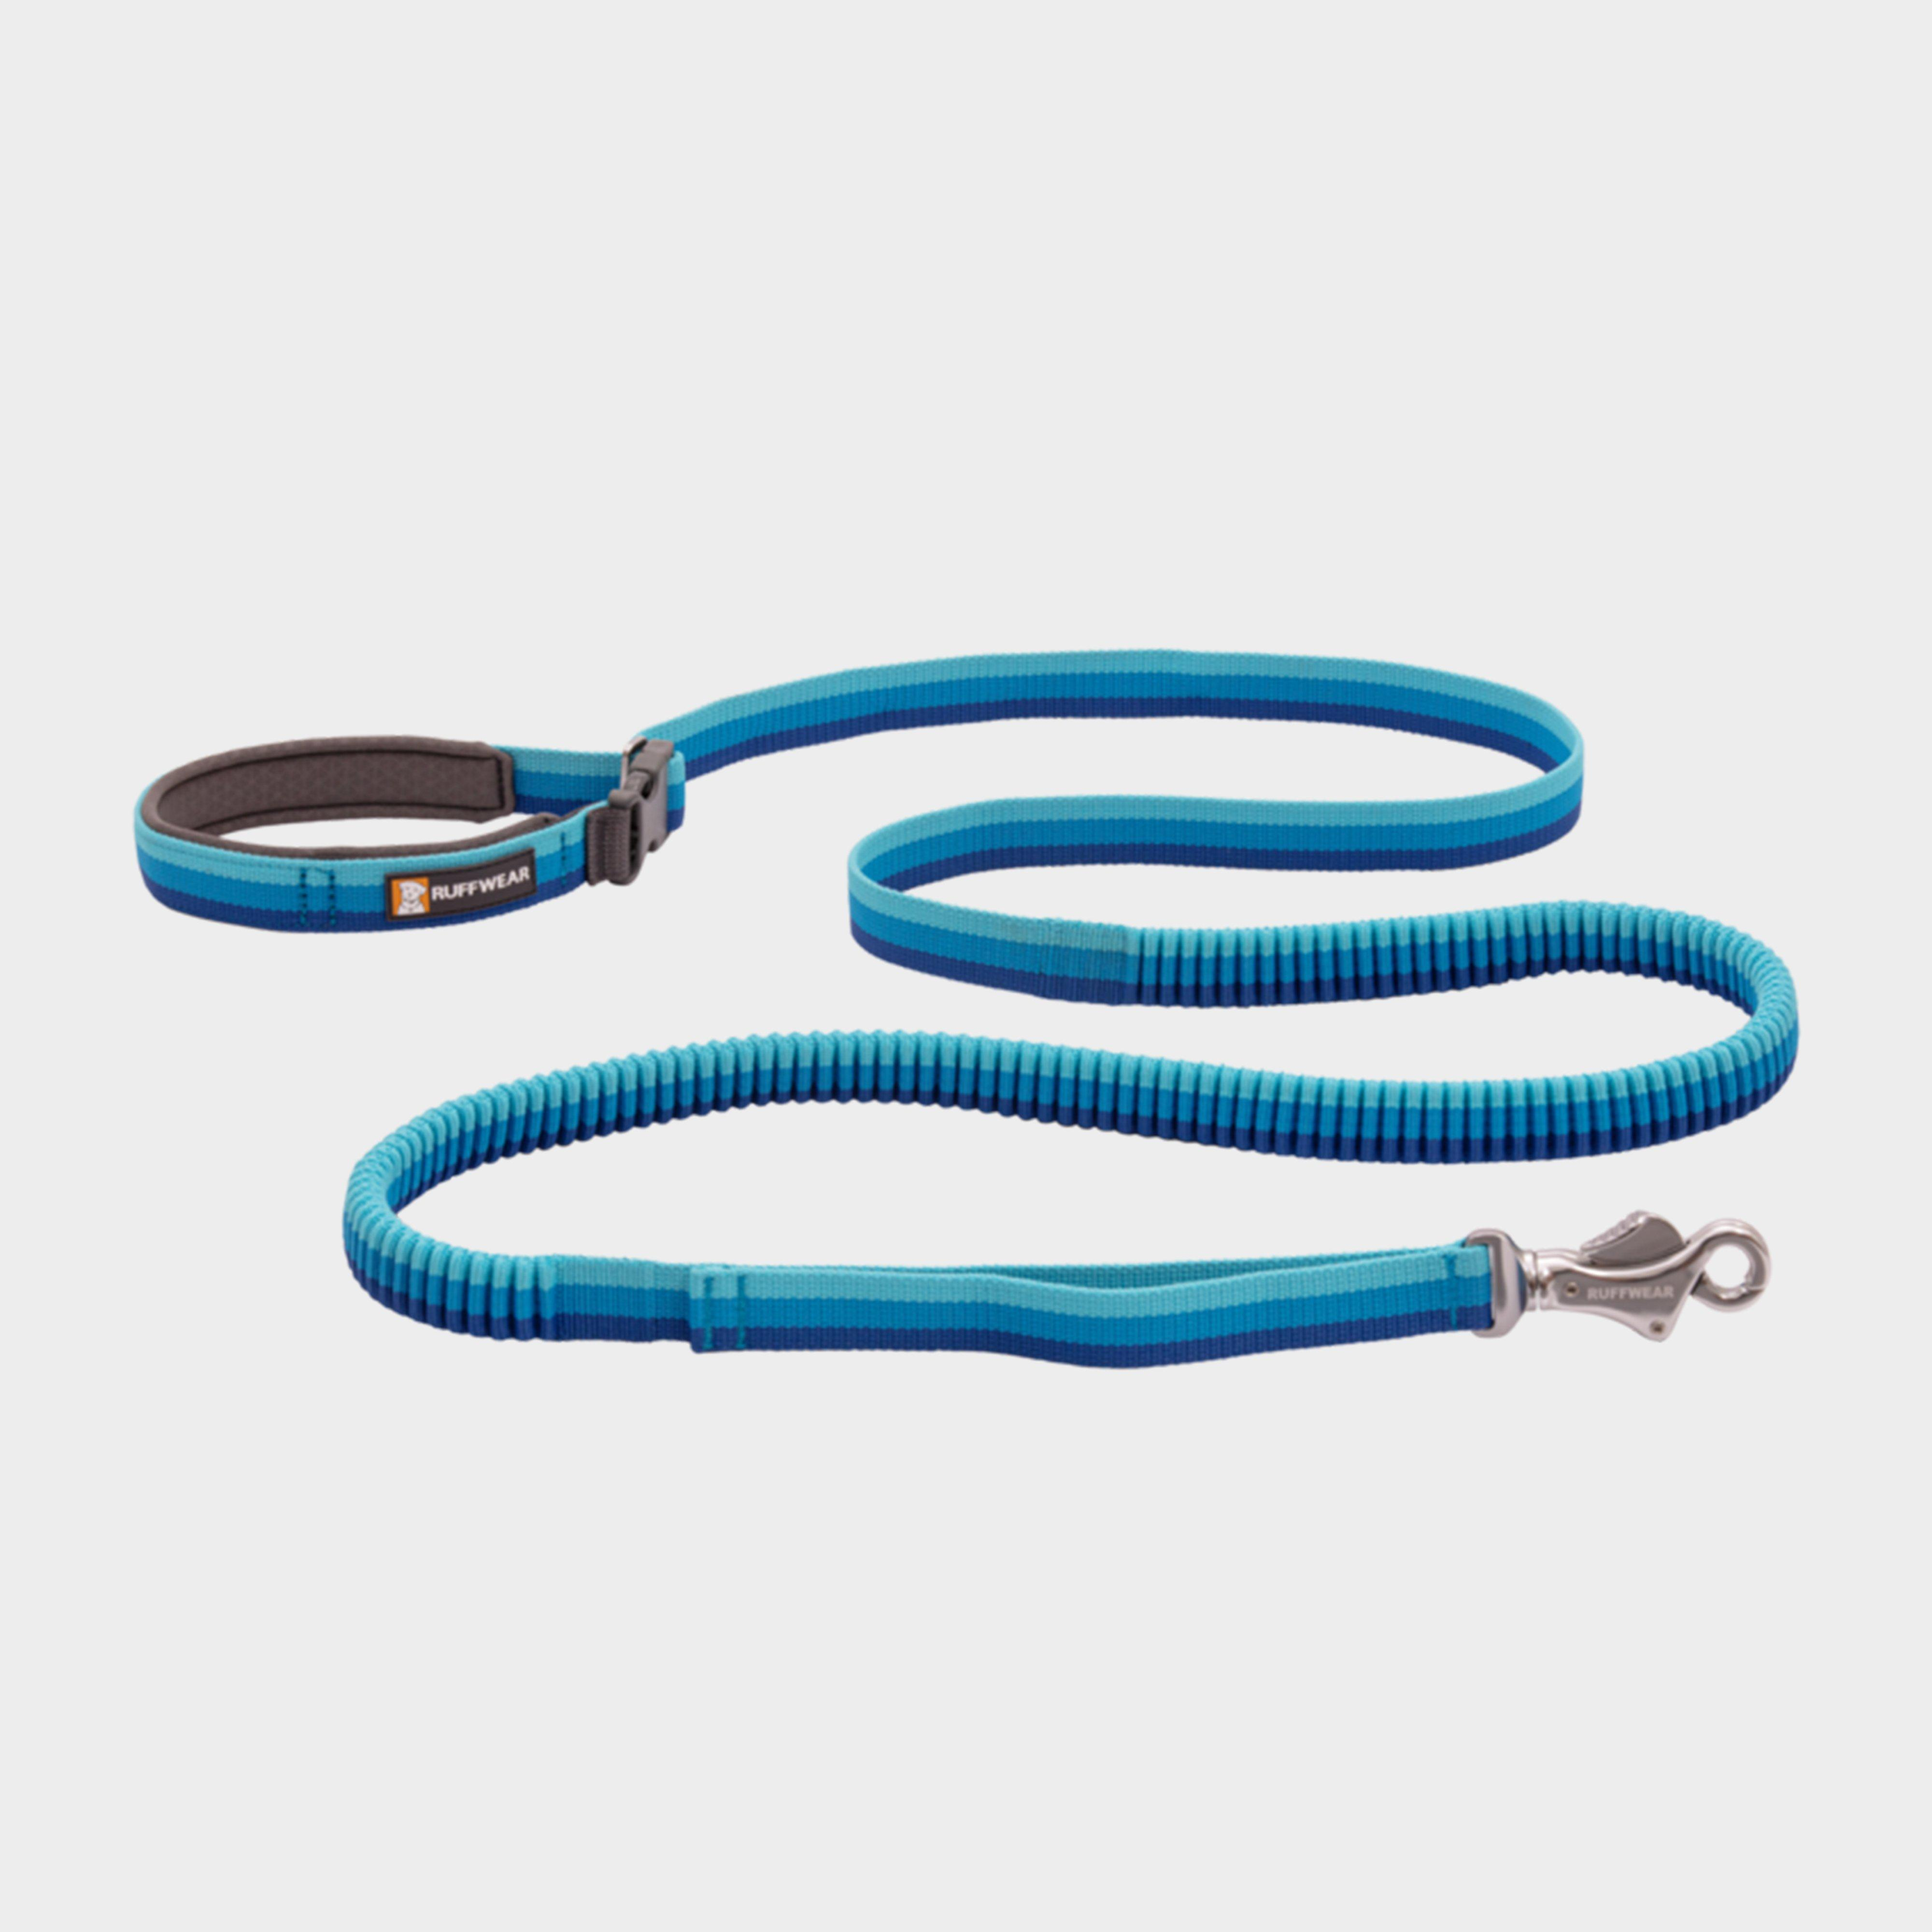 Image of Ruffwear Roamer Bungee Dog Leash - Blue/Blue, Blue/Blue